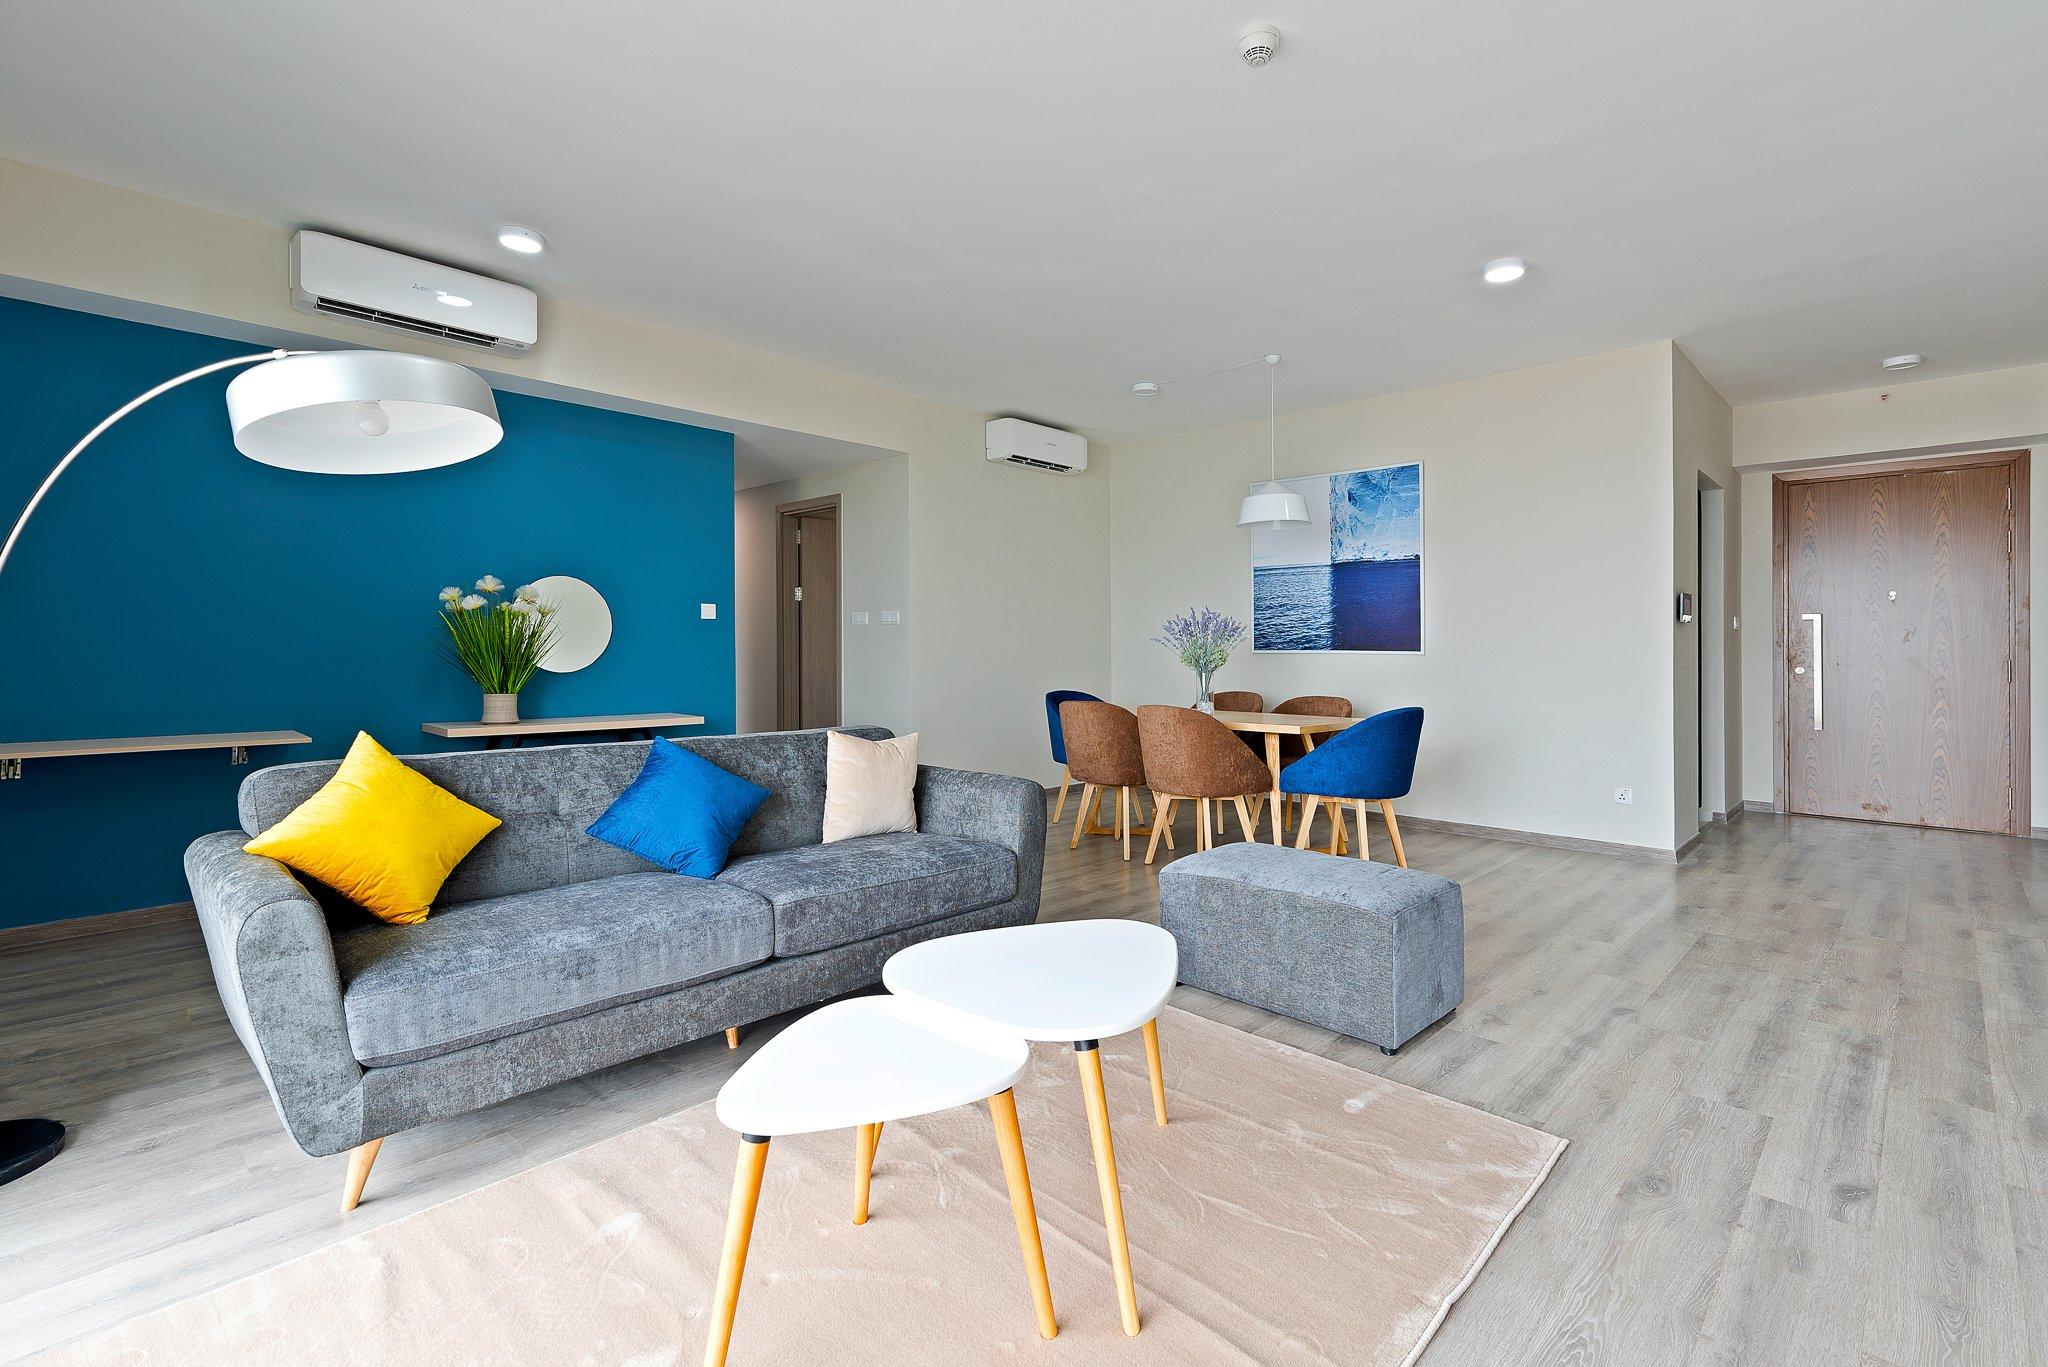 Budget 3 bedroom modern interior apartment Ha Dong